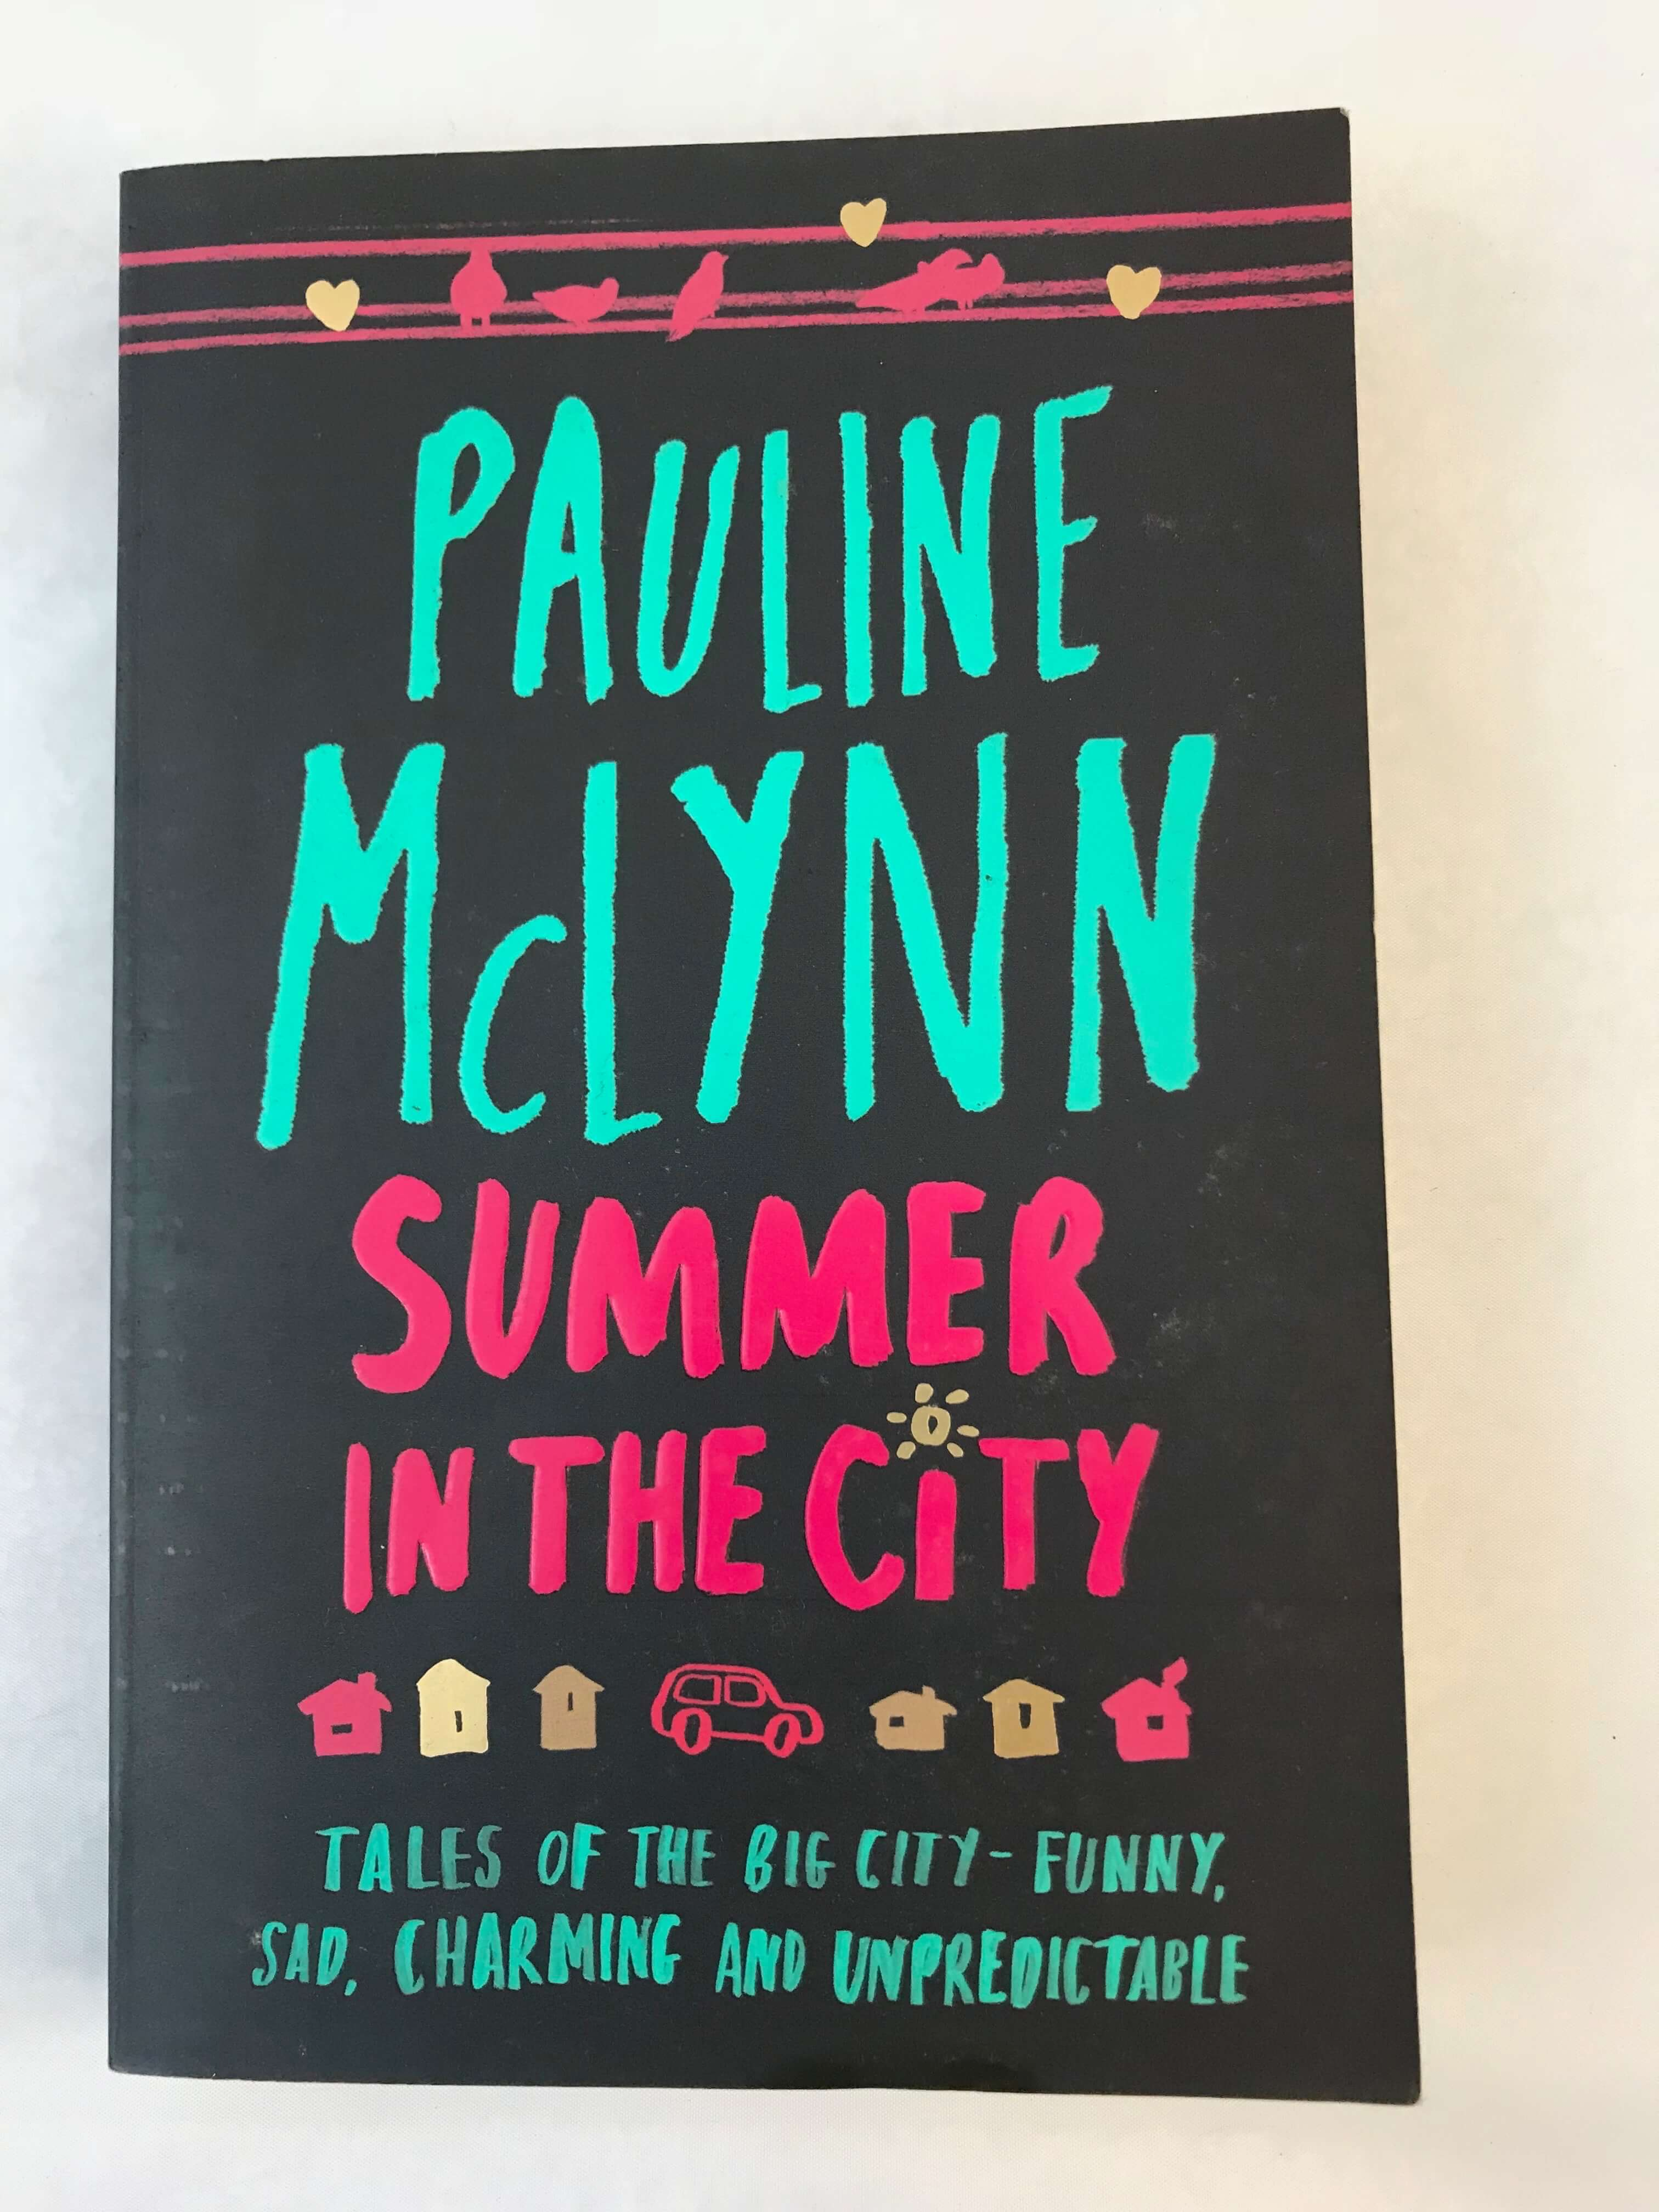 Pauline McLynn: Summer In The City